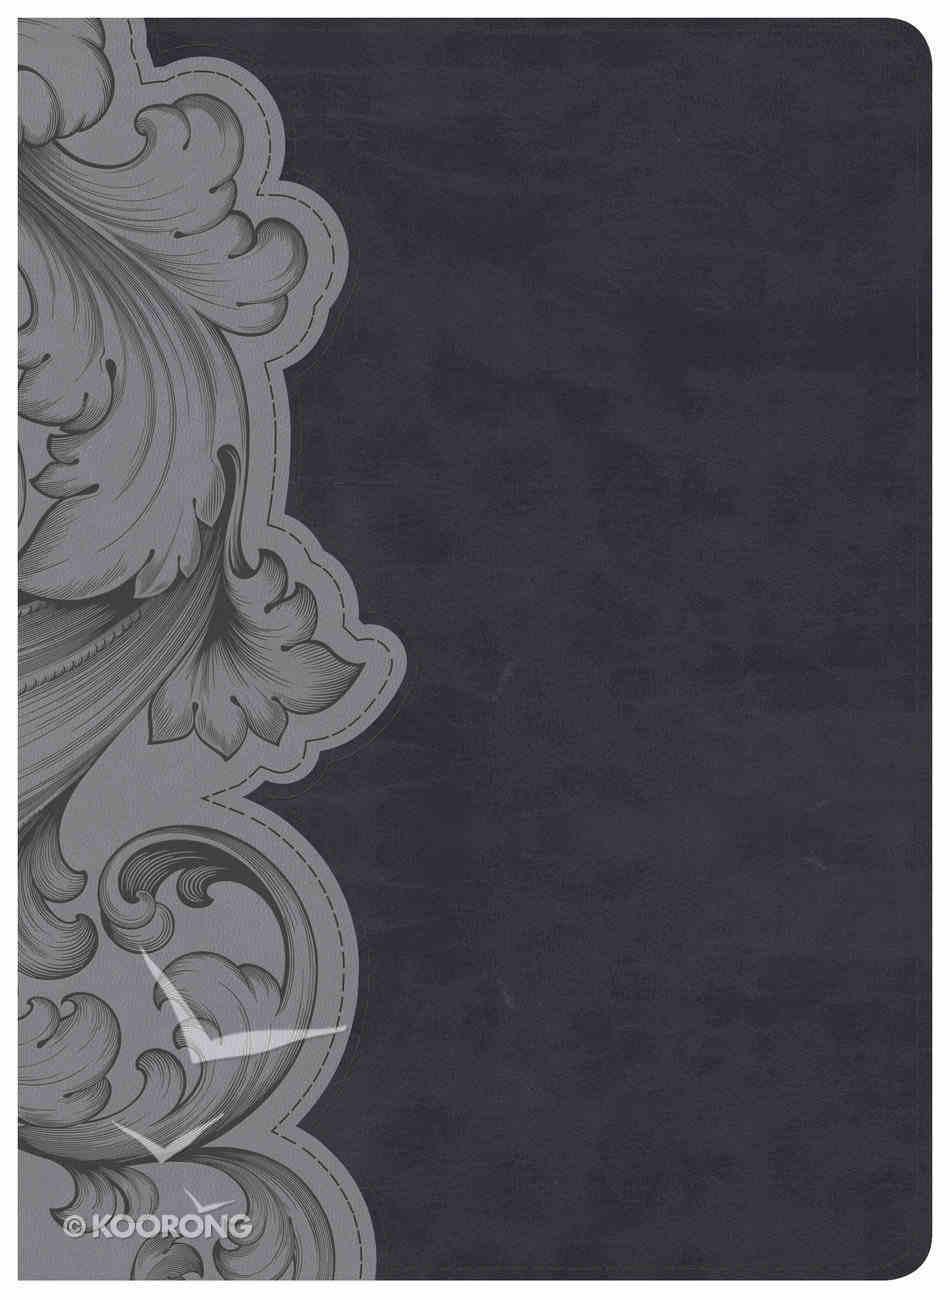 HCSB Study Bible, Smoke/Slate Leathertouch Imitation Leather